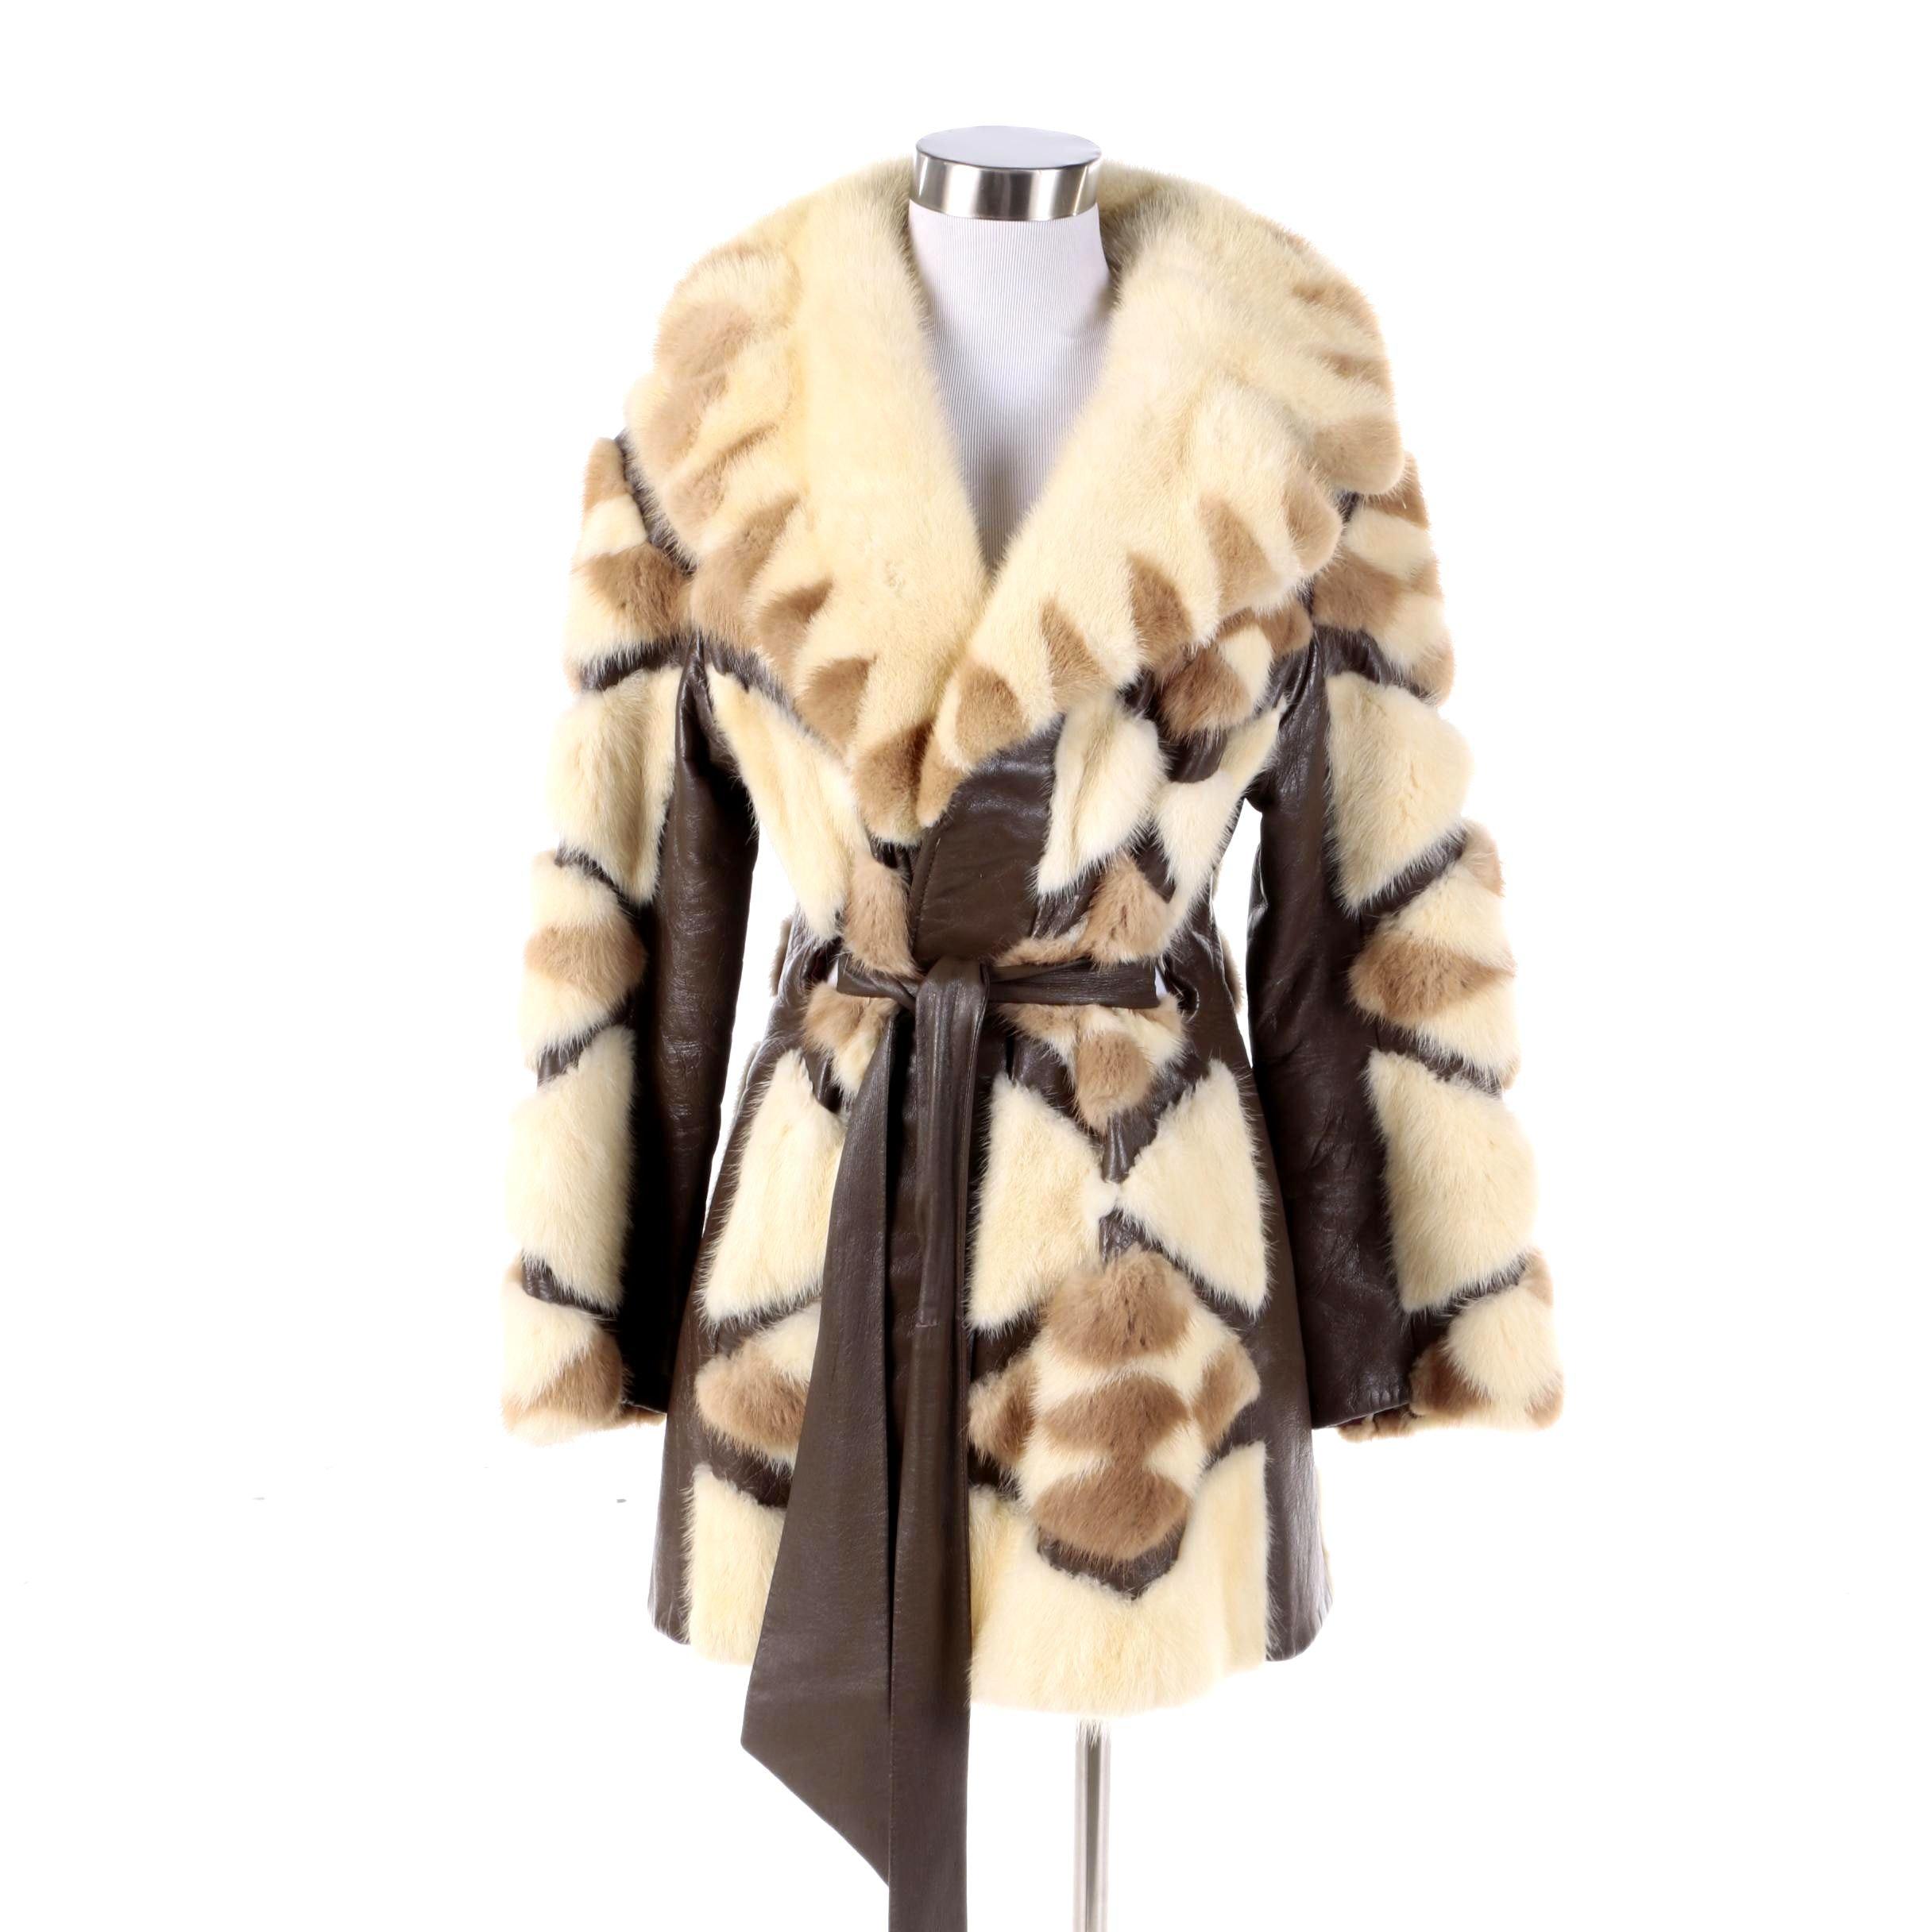 Women's Vintage Ronley Patchwork Mink Fur and Leather Coat